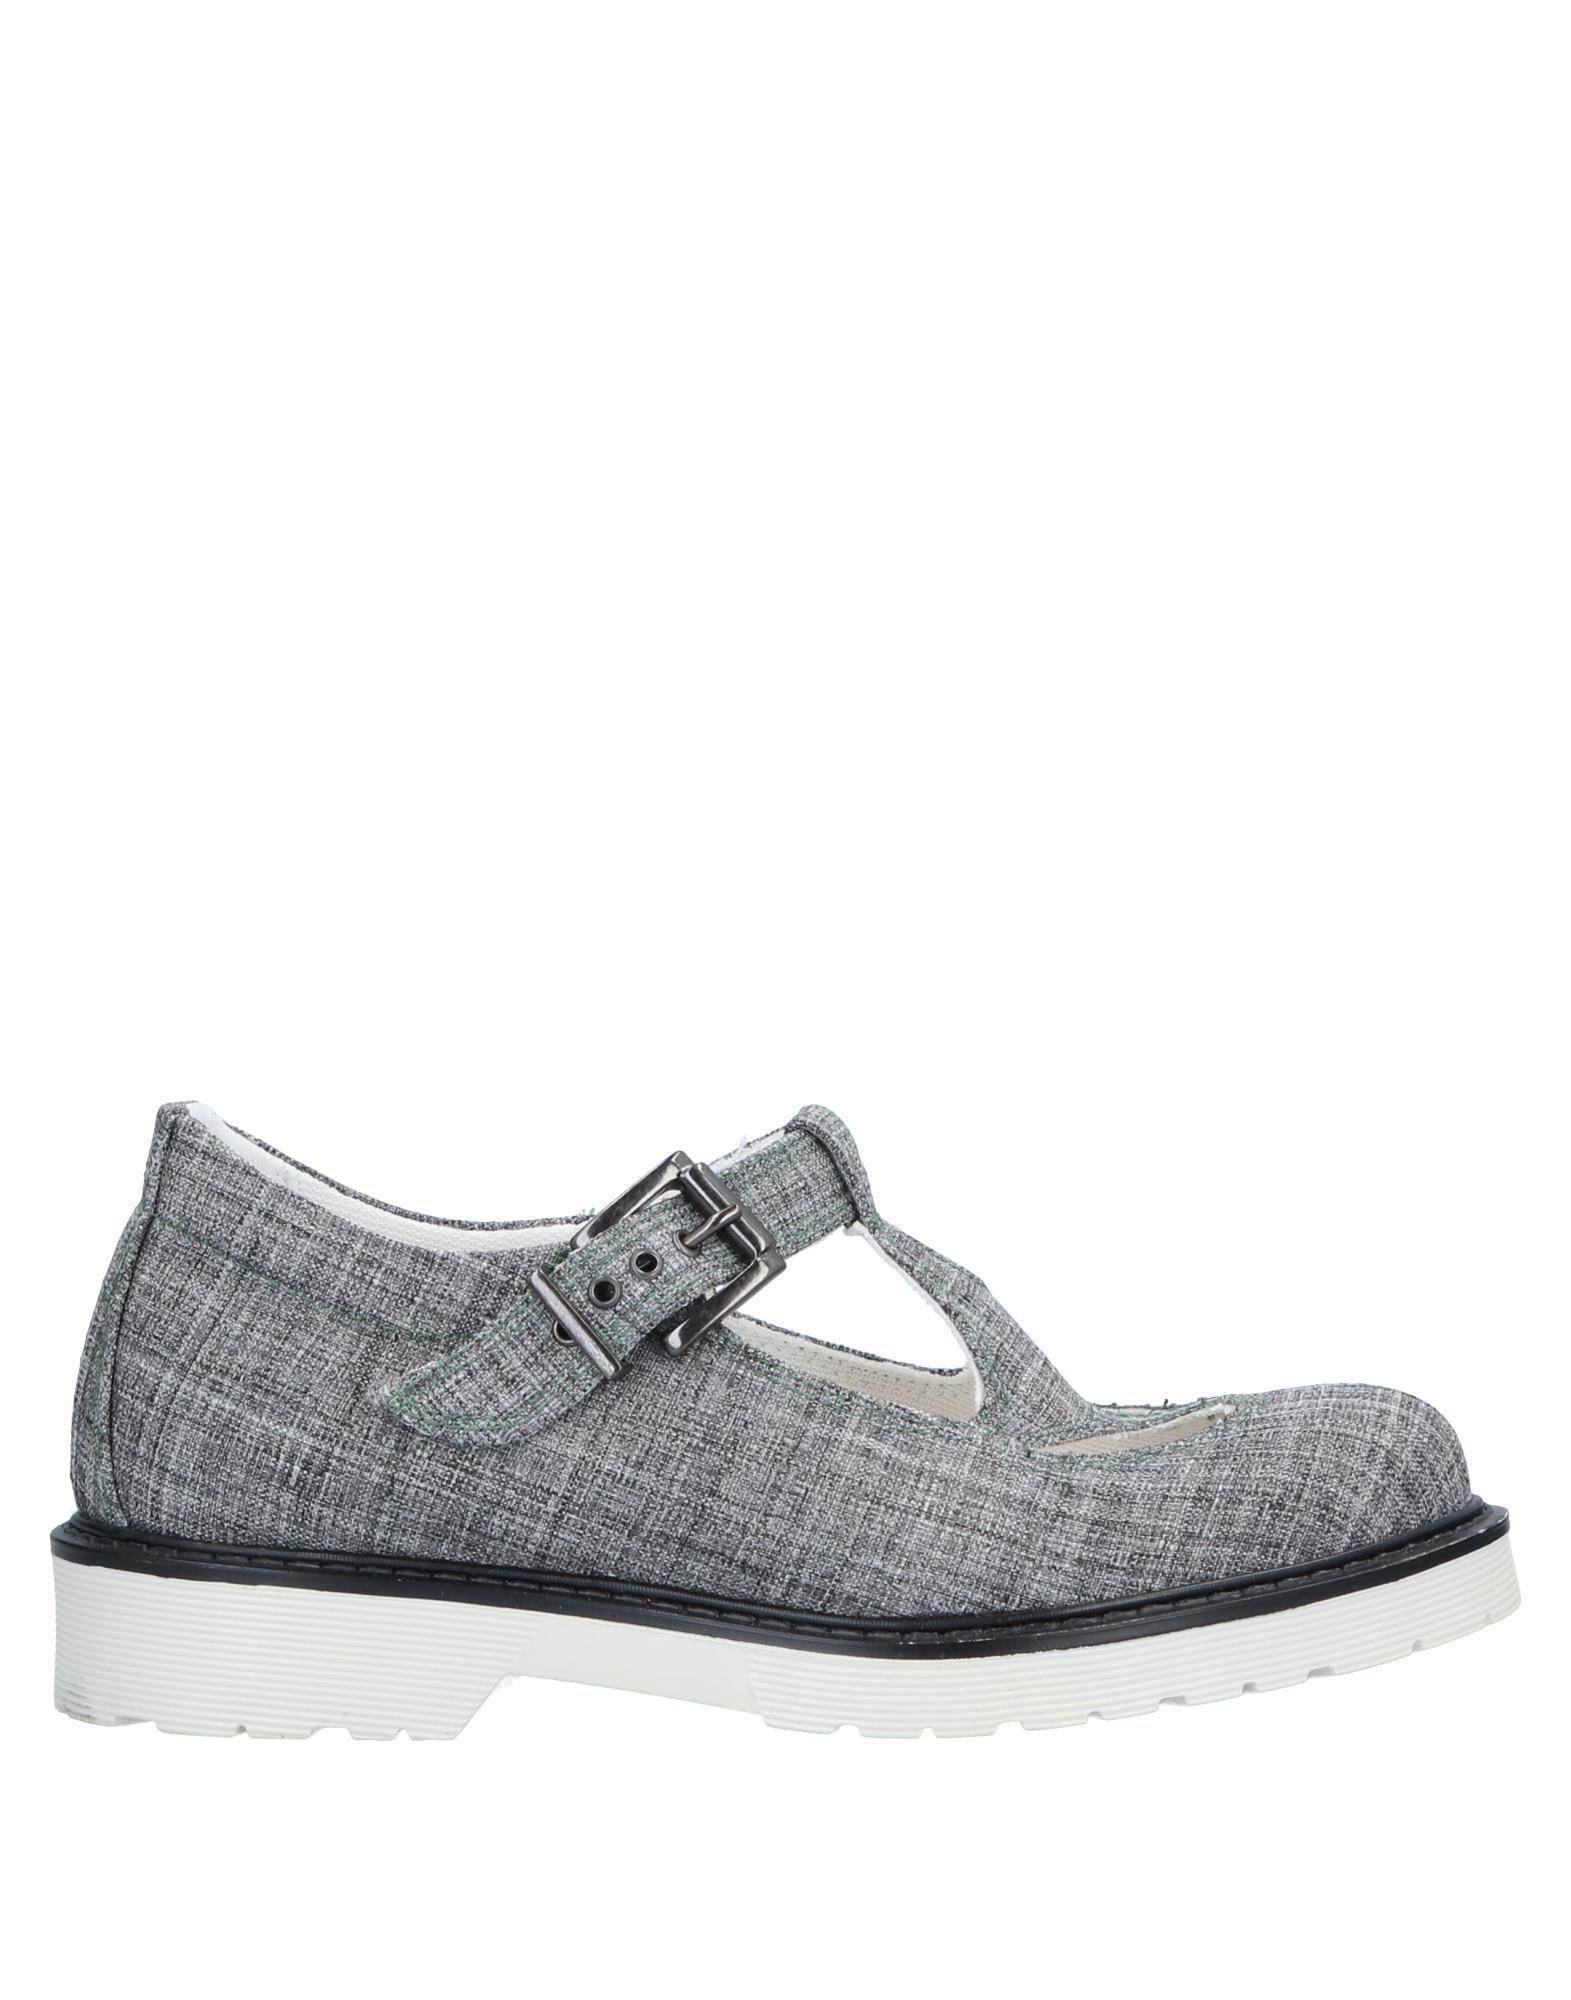 TIPE E TACCHI Sandals in Grey